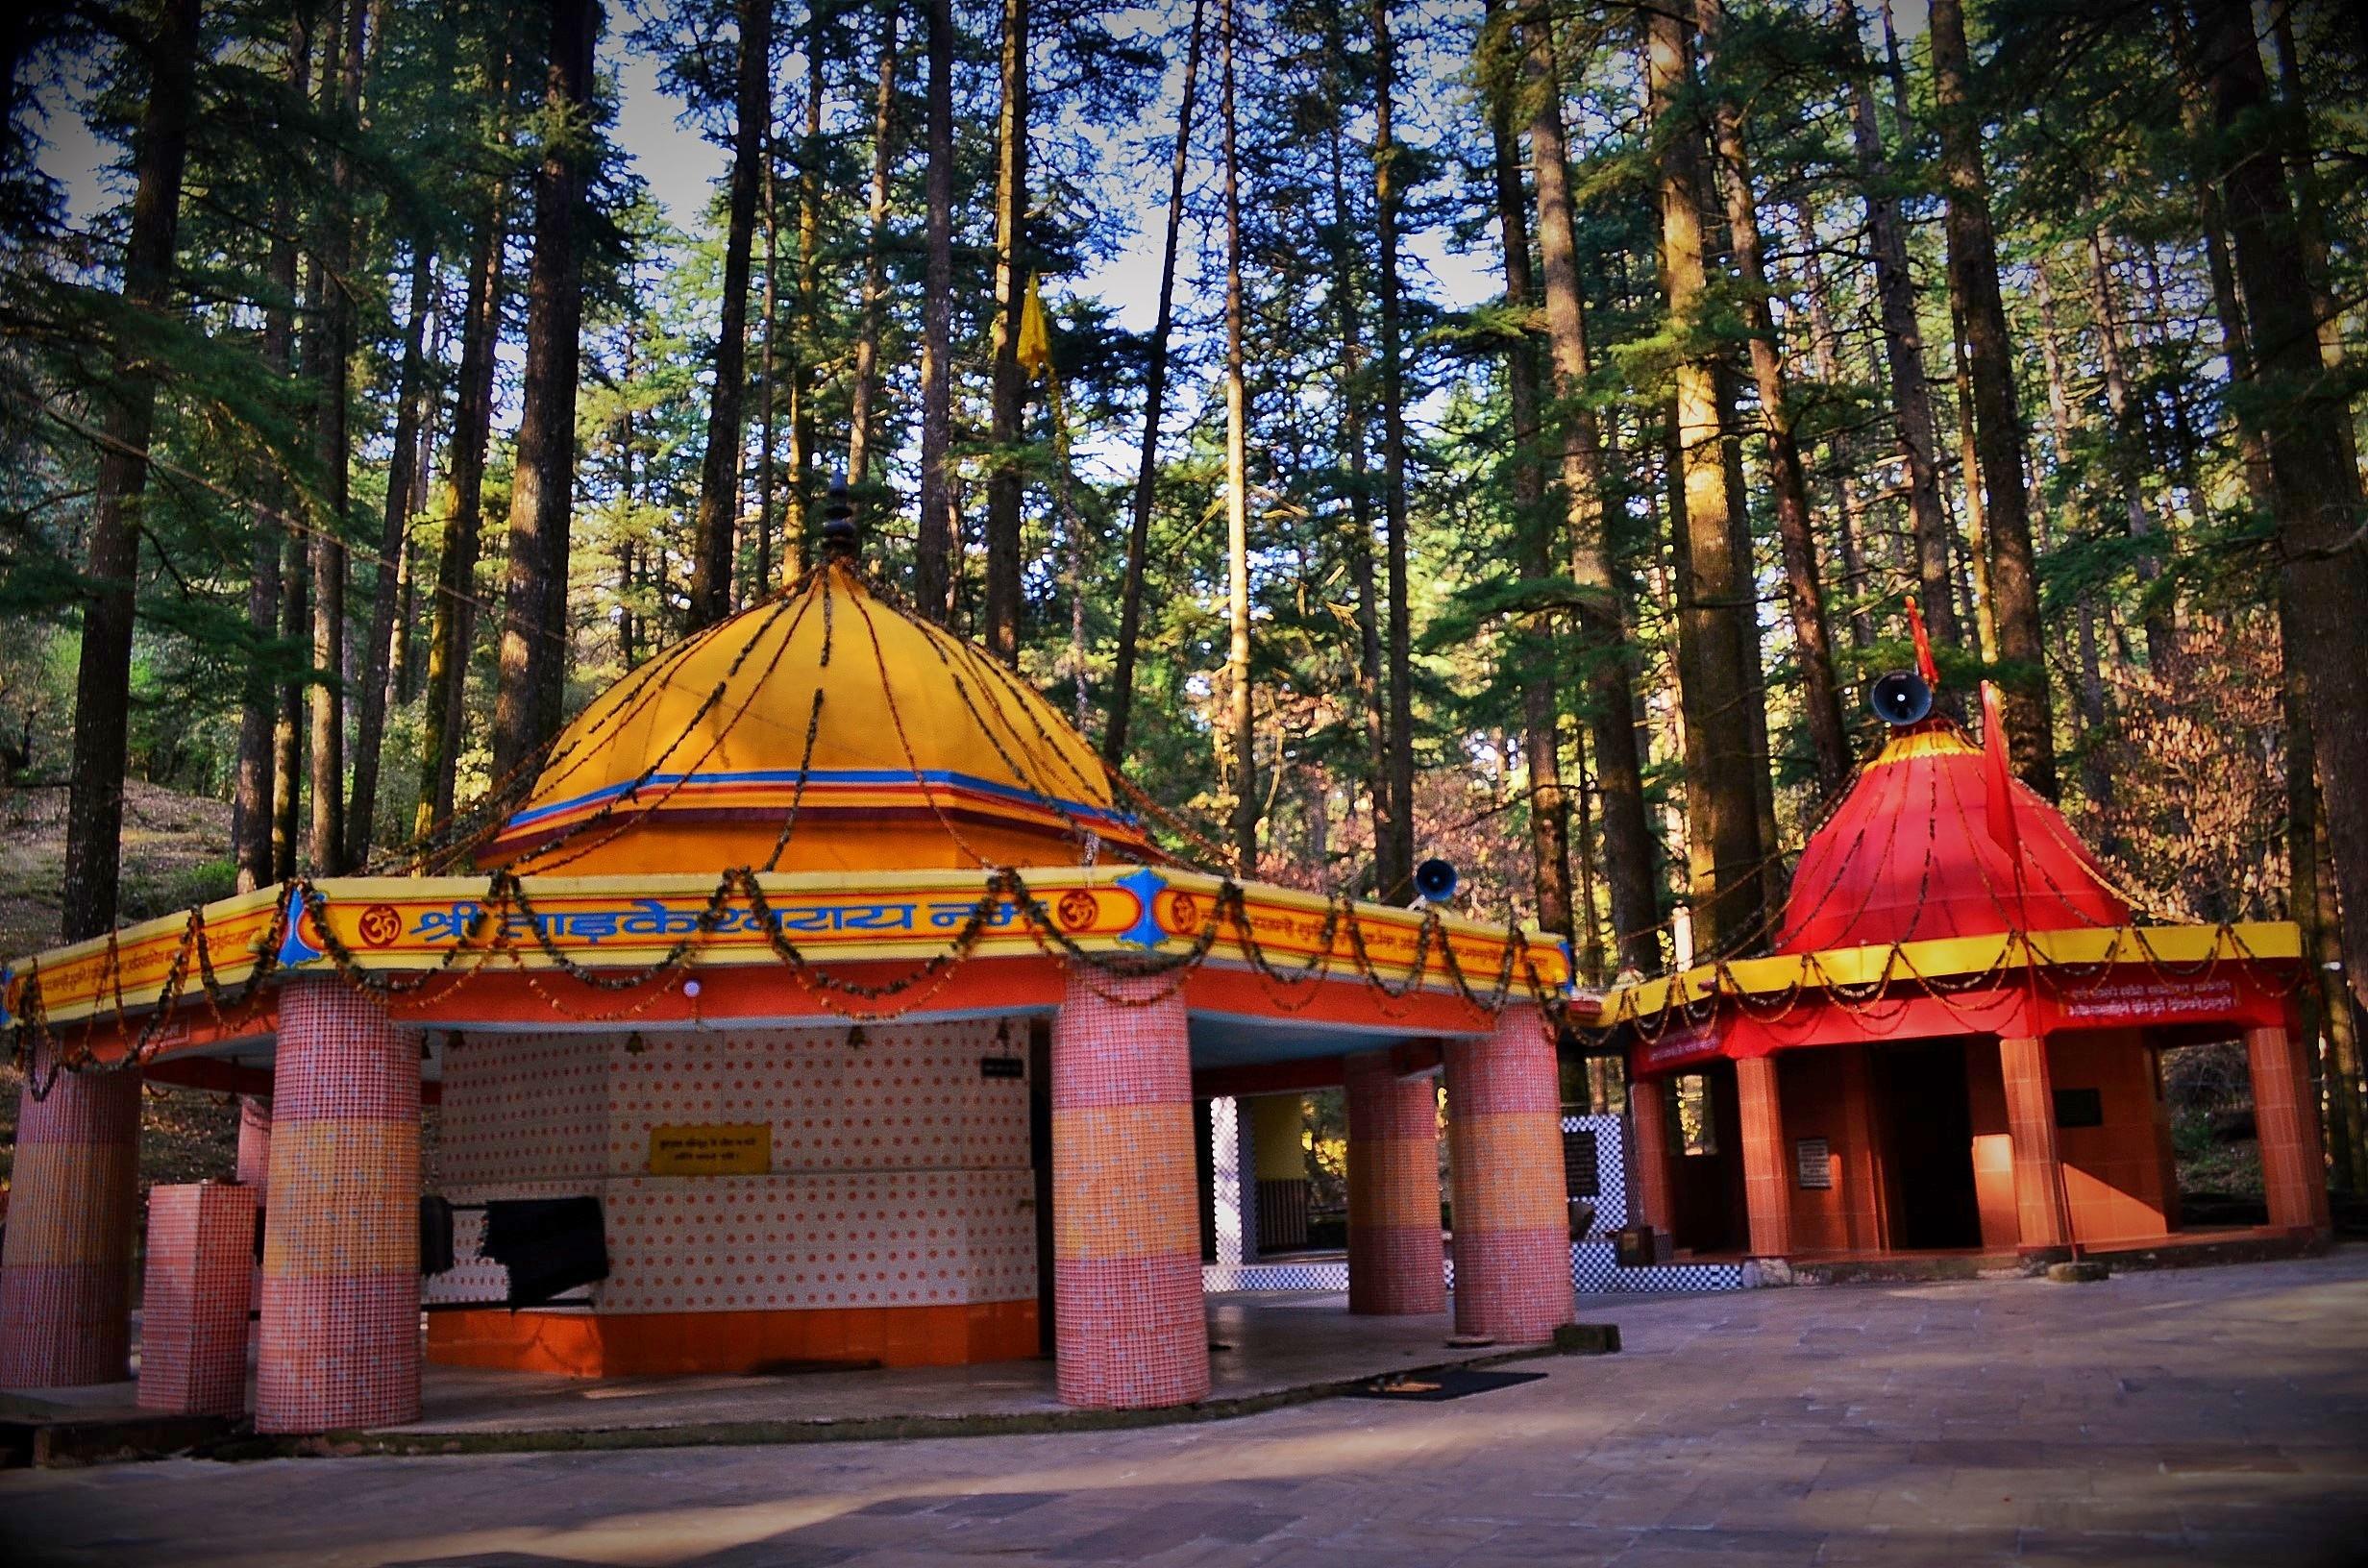 PunjabKesari, Tadkeshwar Temple in Uttarakhand, Tadkeshwar Temple, Uttarakhand Tadkeshwar Temple, lord Shiva, Tadkasur, Kartikeya, ताड़केश्वर मंदिर, उत्तराखंड ताड़केश्वर मंदिर, Devi Lakshmi, Dhanteras 2020, Dharmik Sthal, Religious Place in india, Hindu teerth Sthal